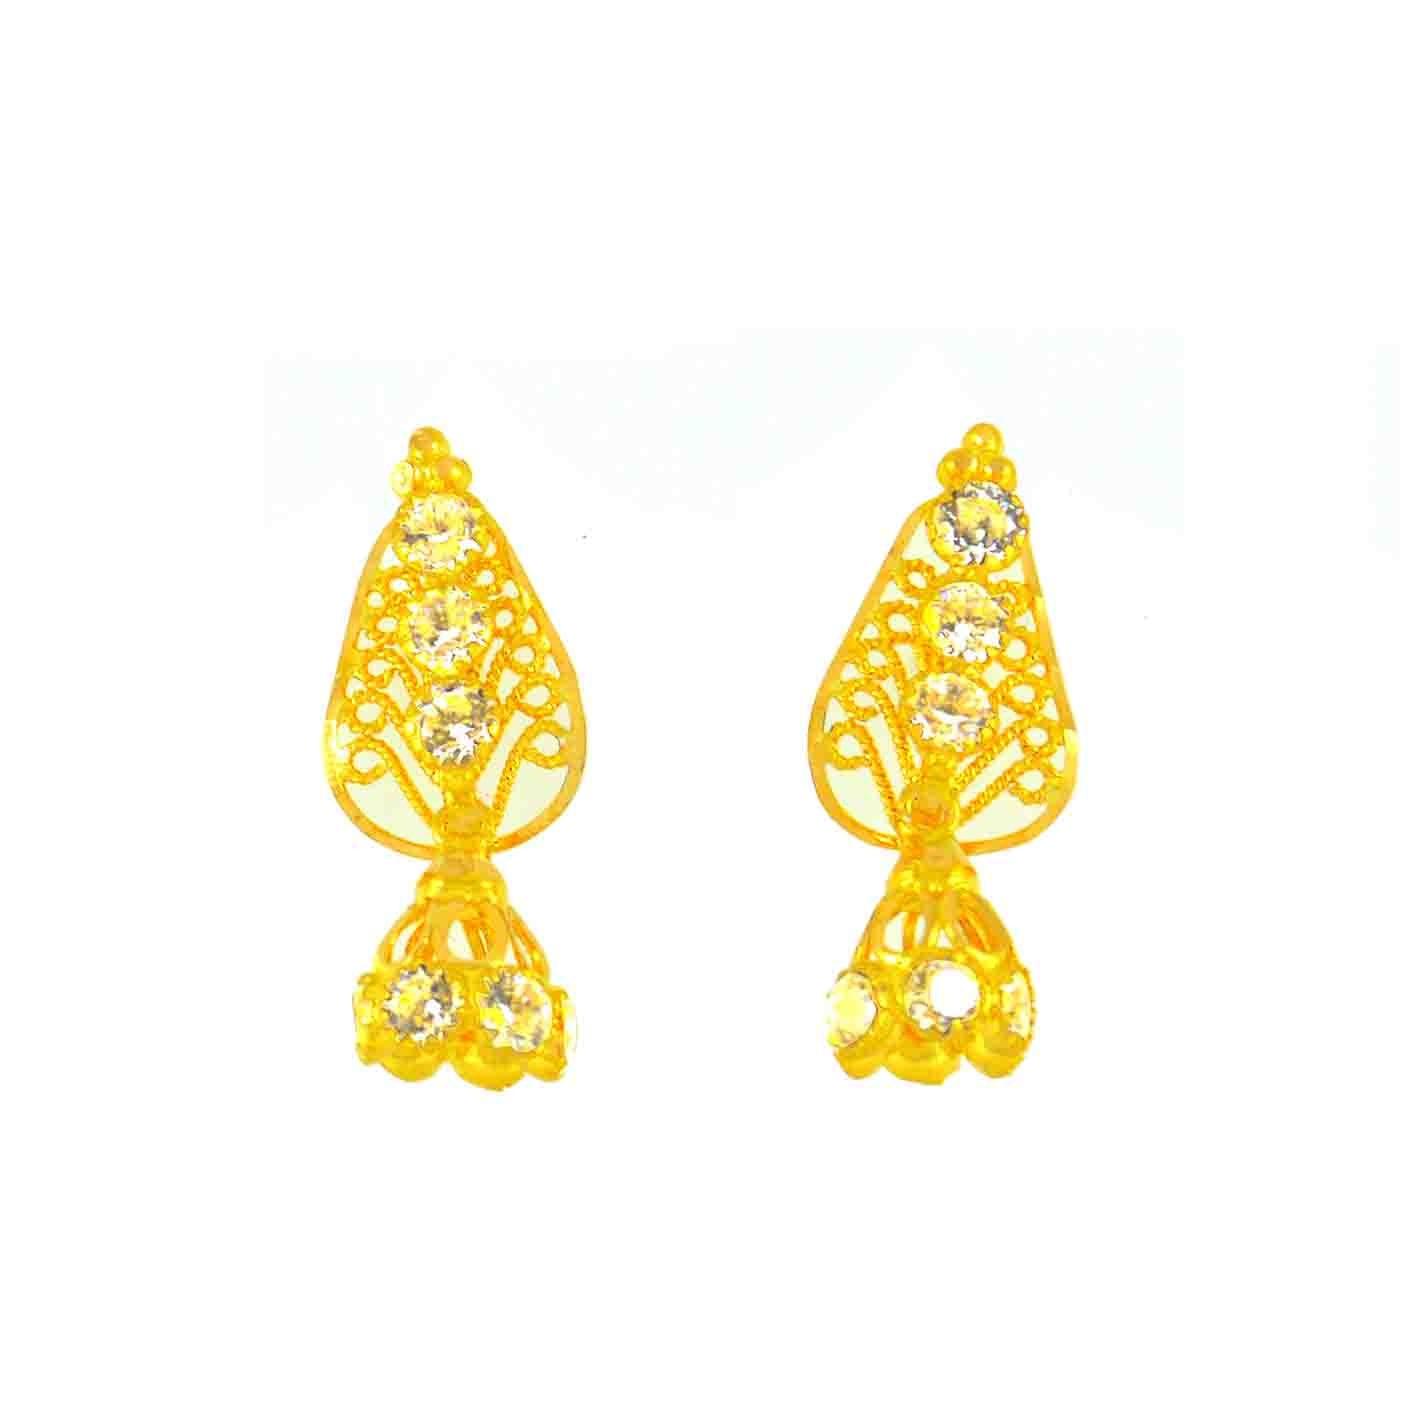 22ct 916 Hallmark Yellow Gold Dangling Earrings CZ LE7